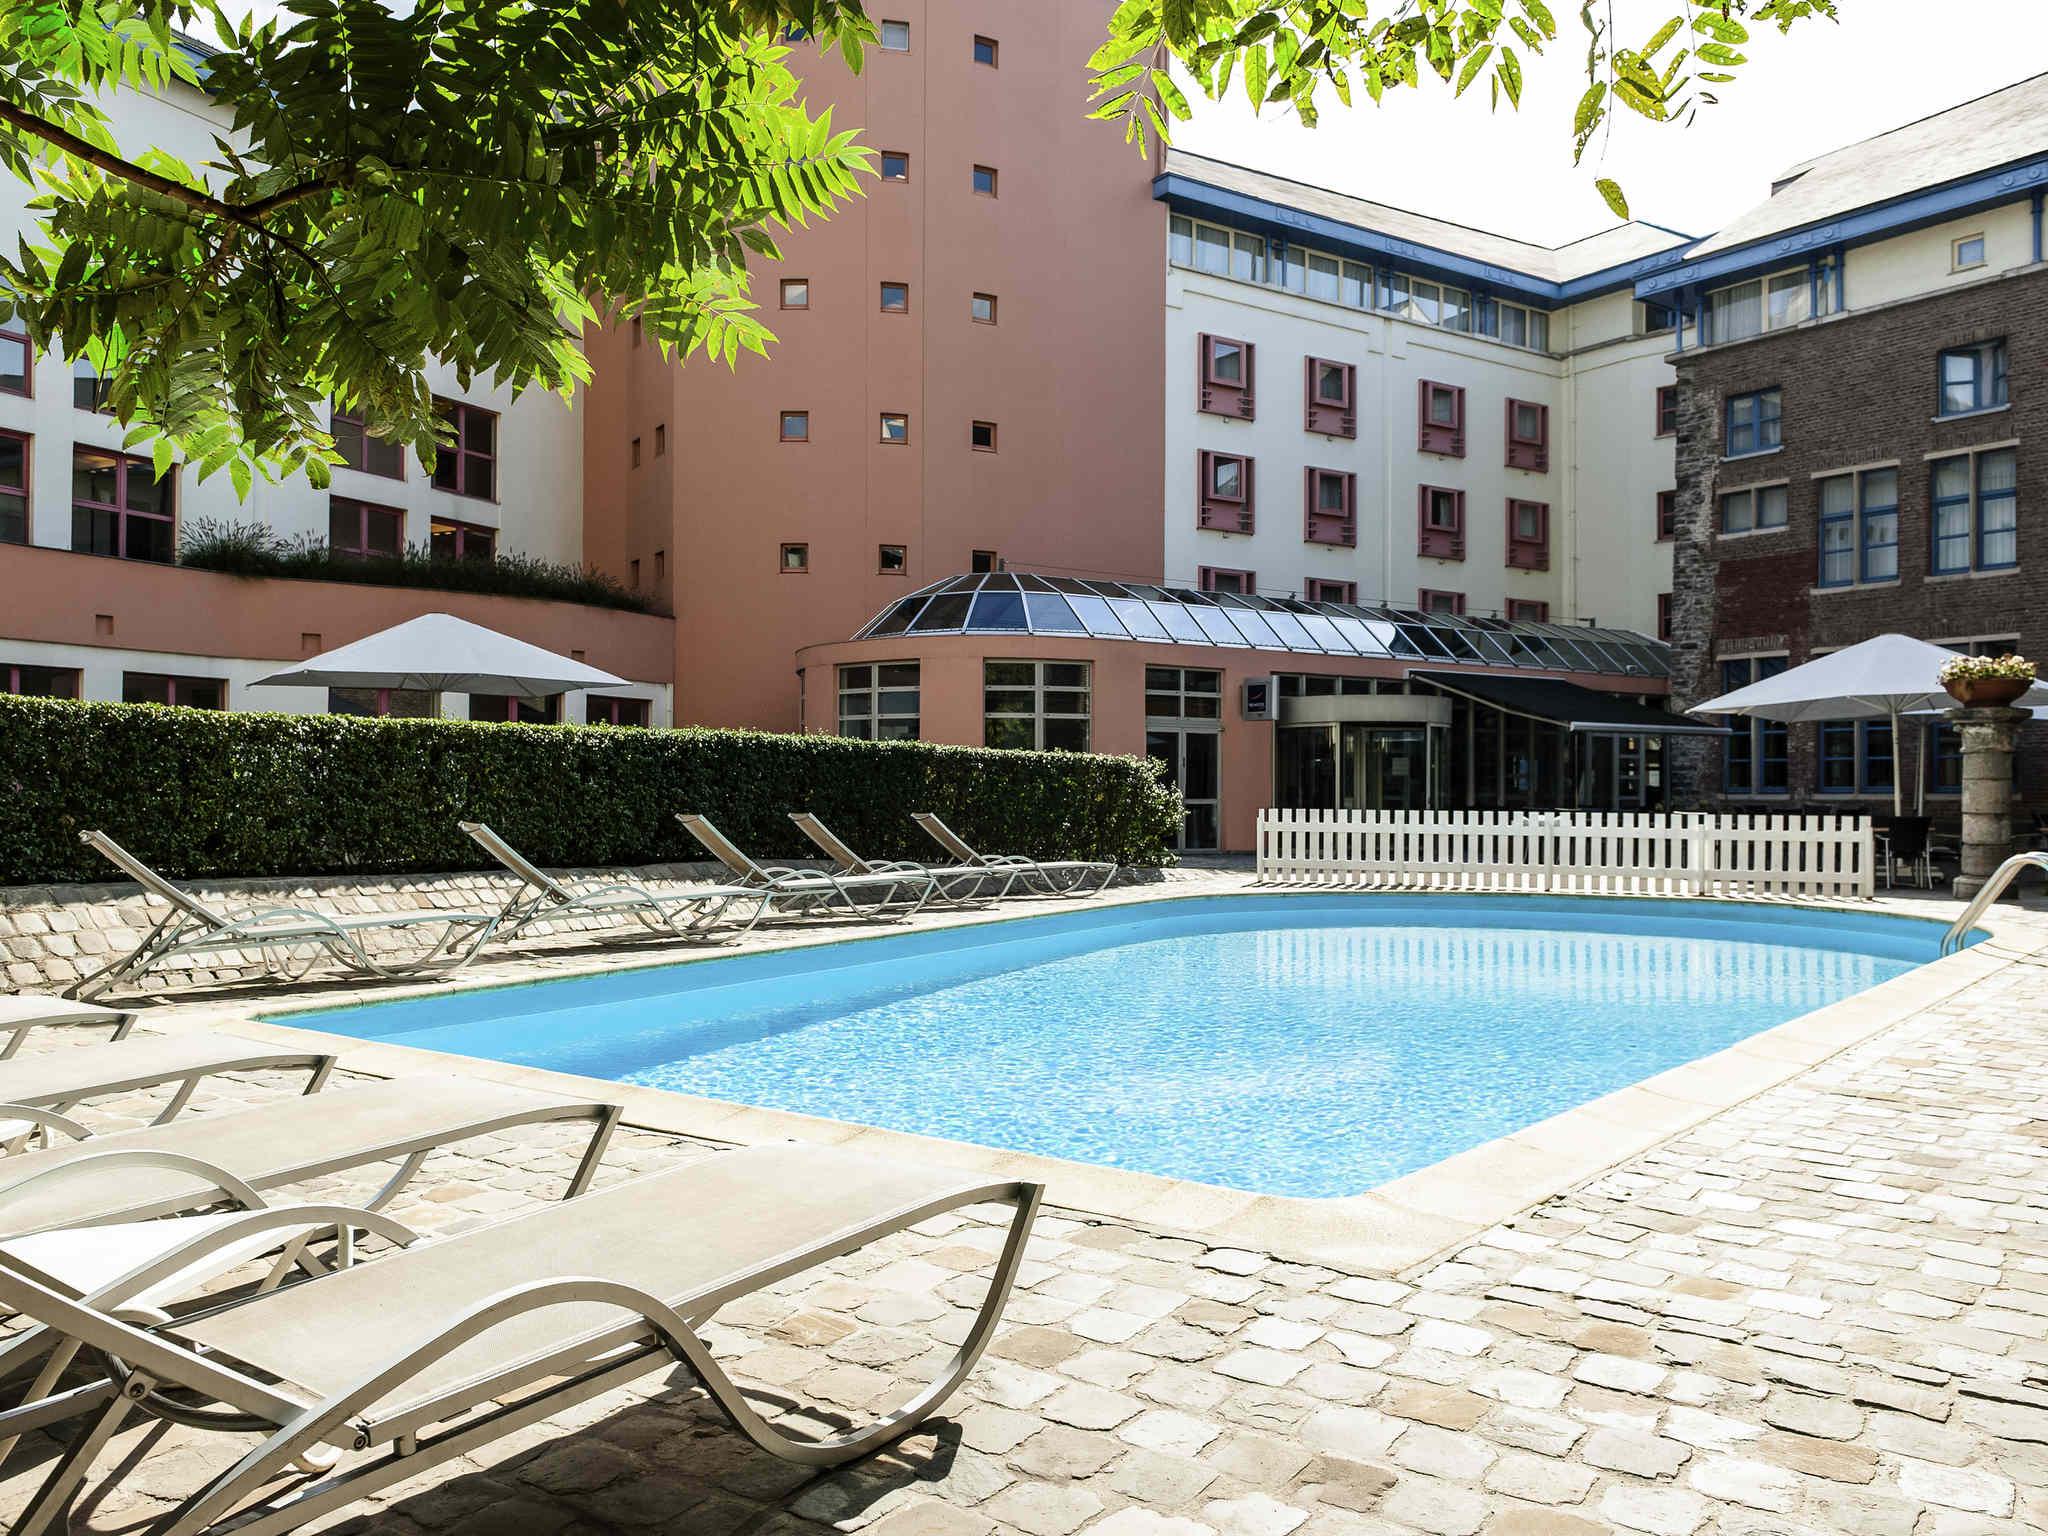 Hotell – Novotel Gent Centrum